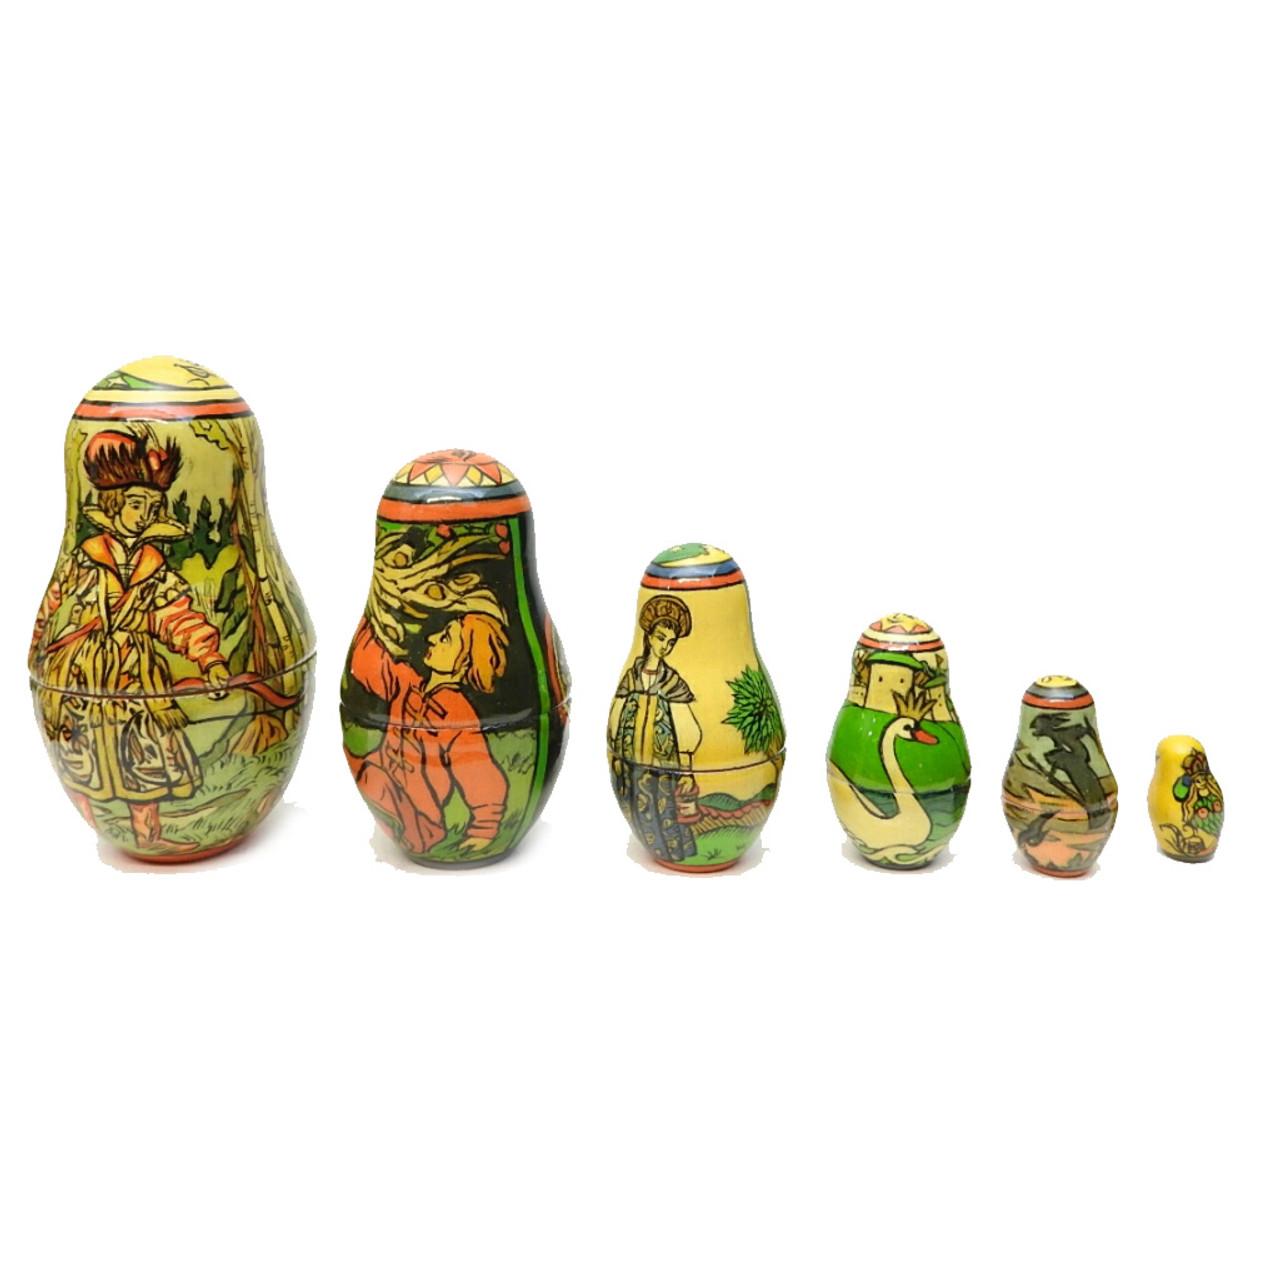 Bilibin Fairy Tales Illustrations Artistic Matryoshka Last 6 Dolls